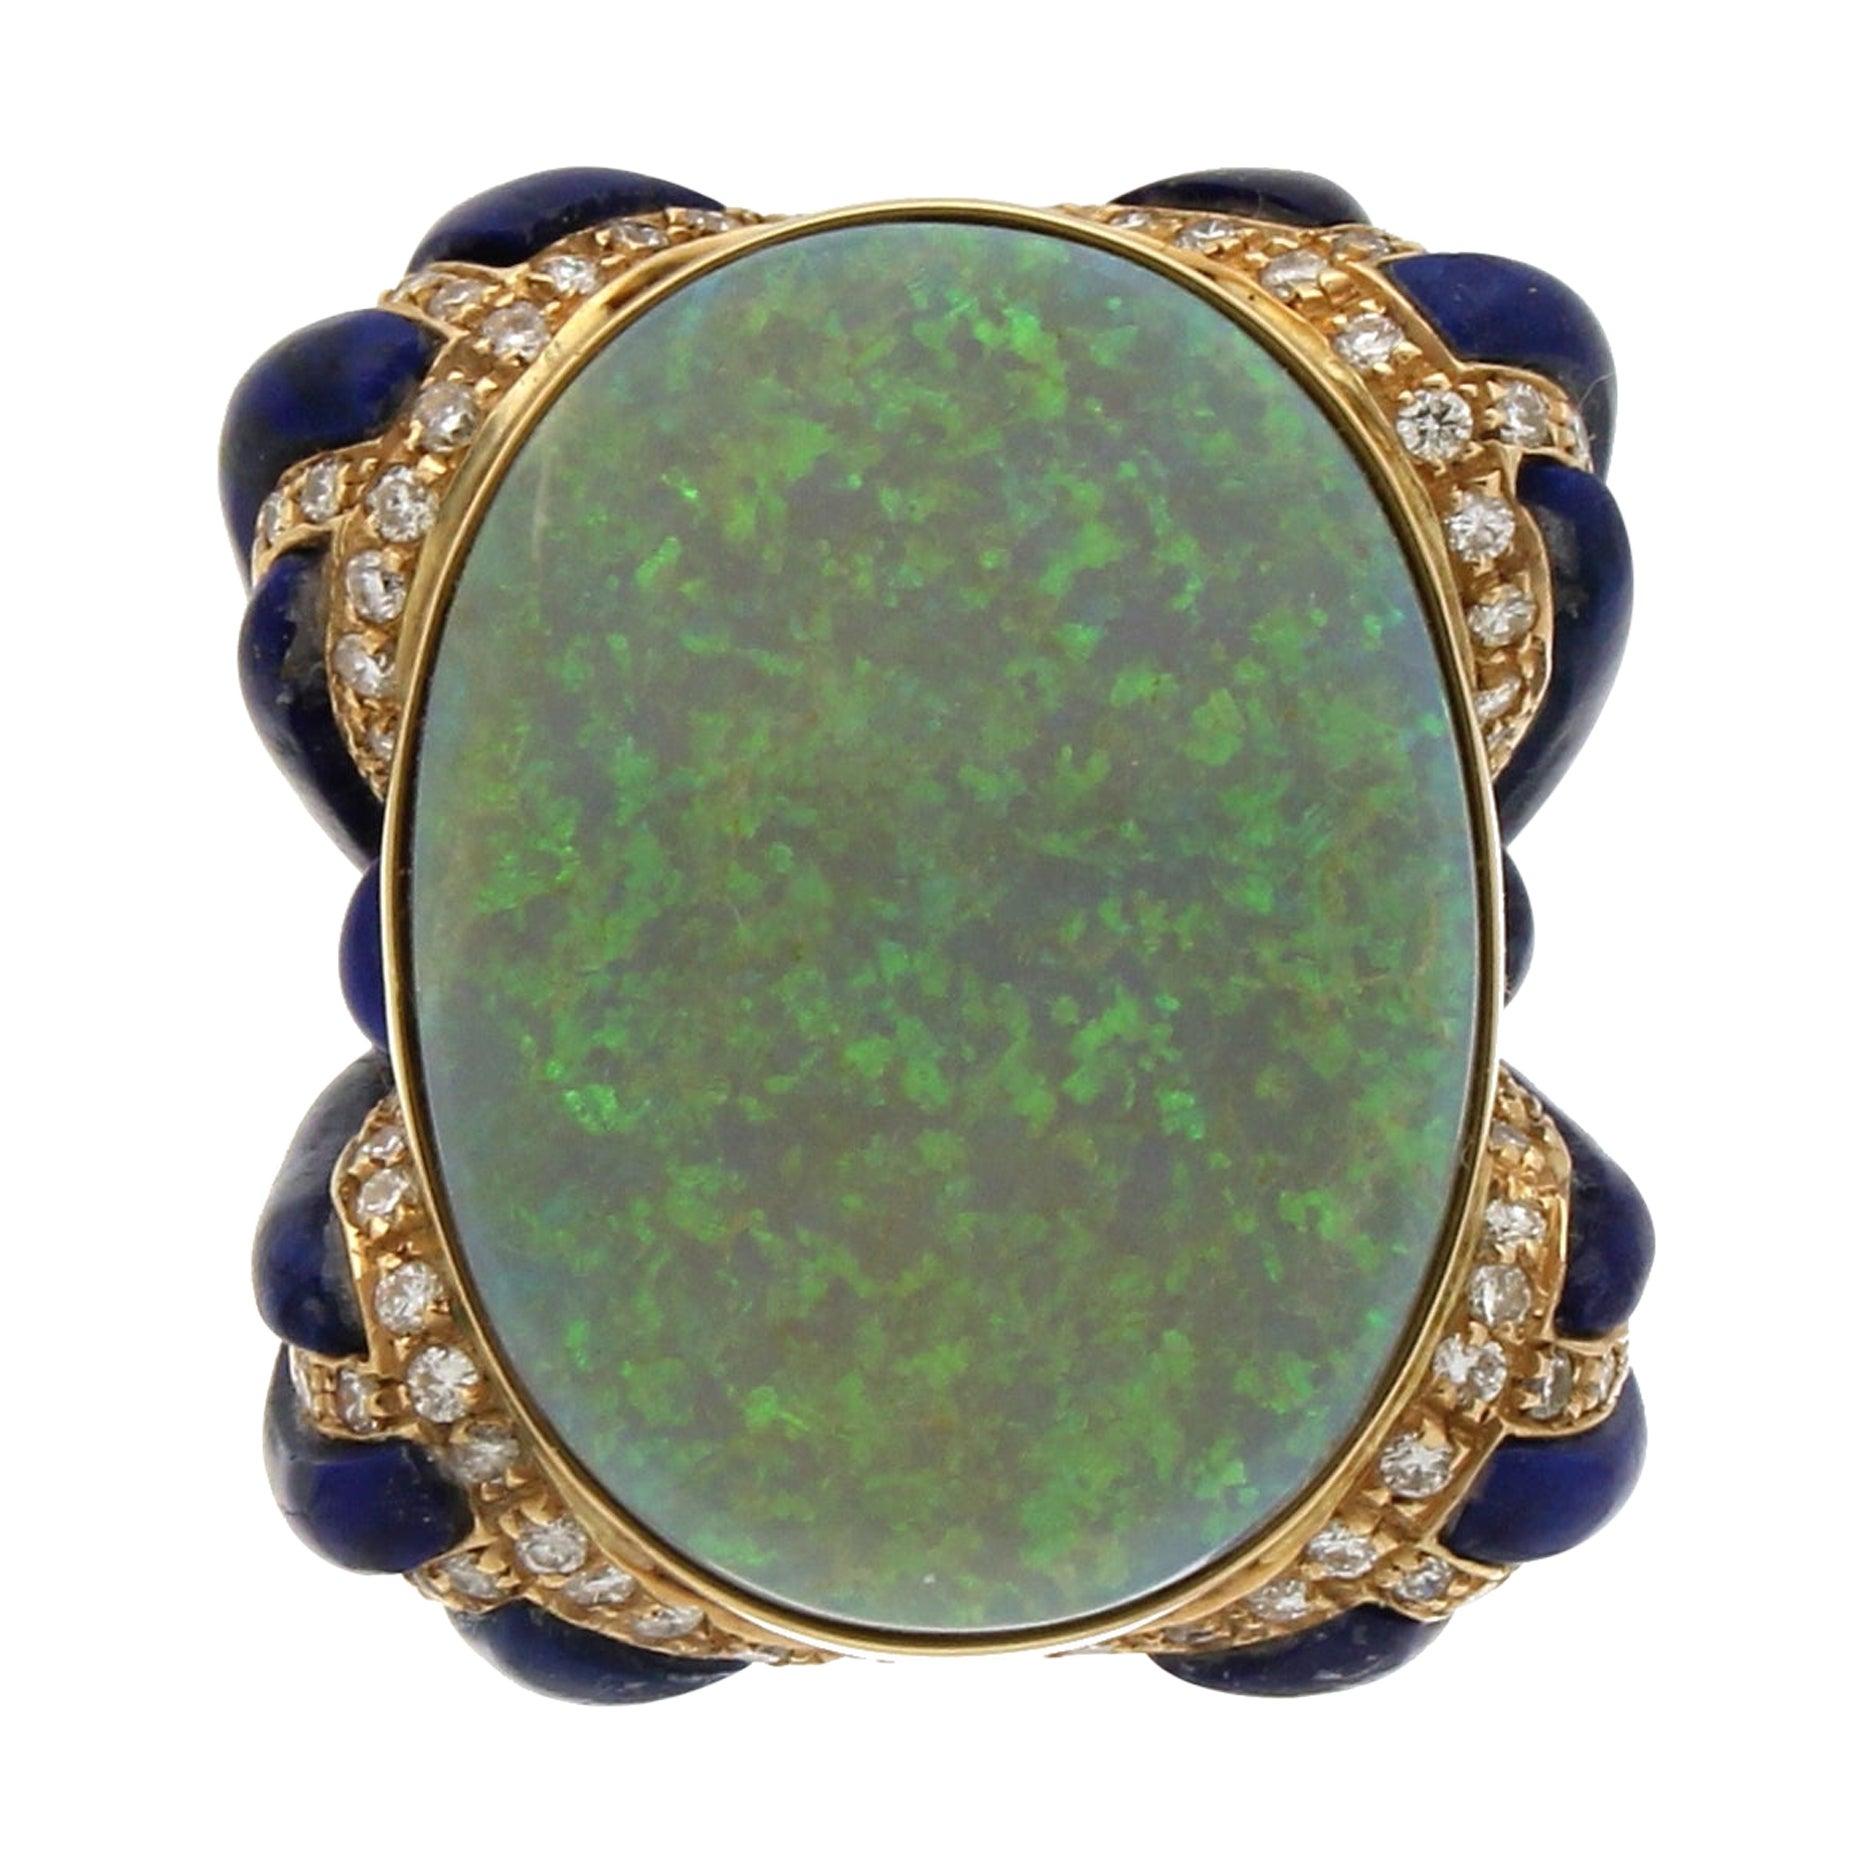 Handcraft 18 Karat Yellow Gold Diamonds Lapis Australian Opal Cocktail Ring